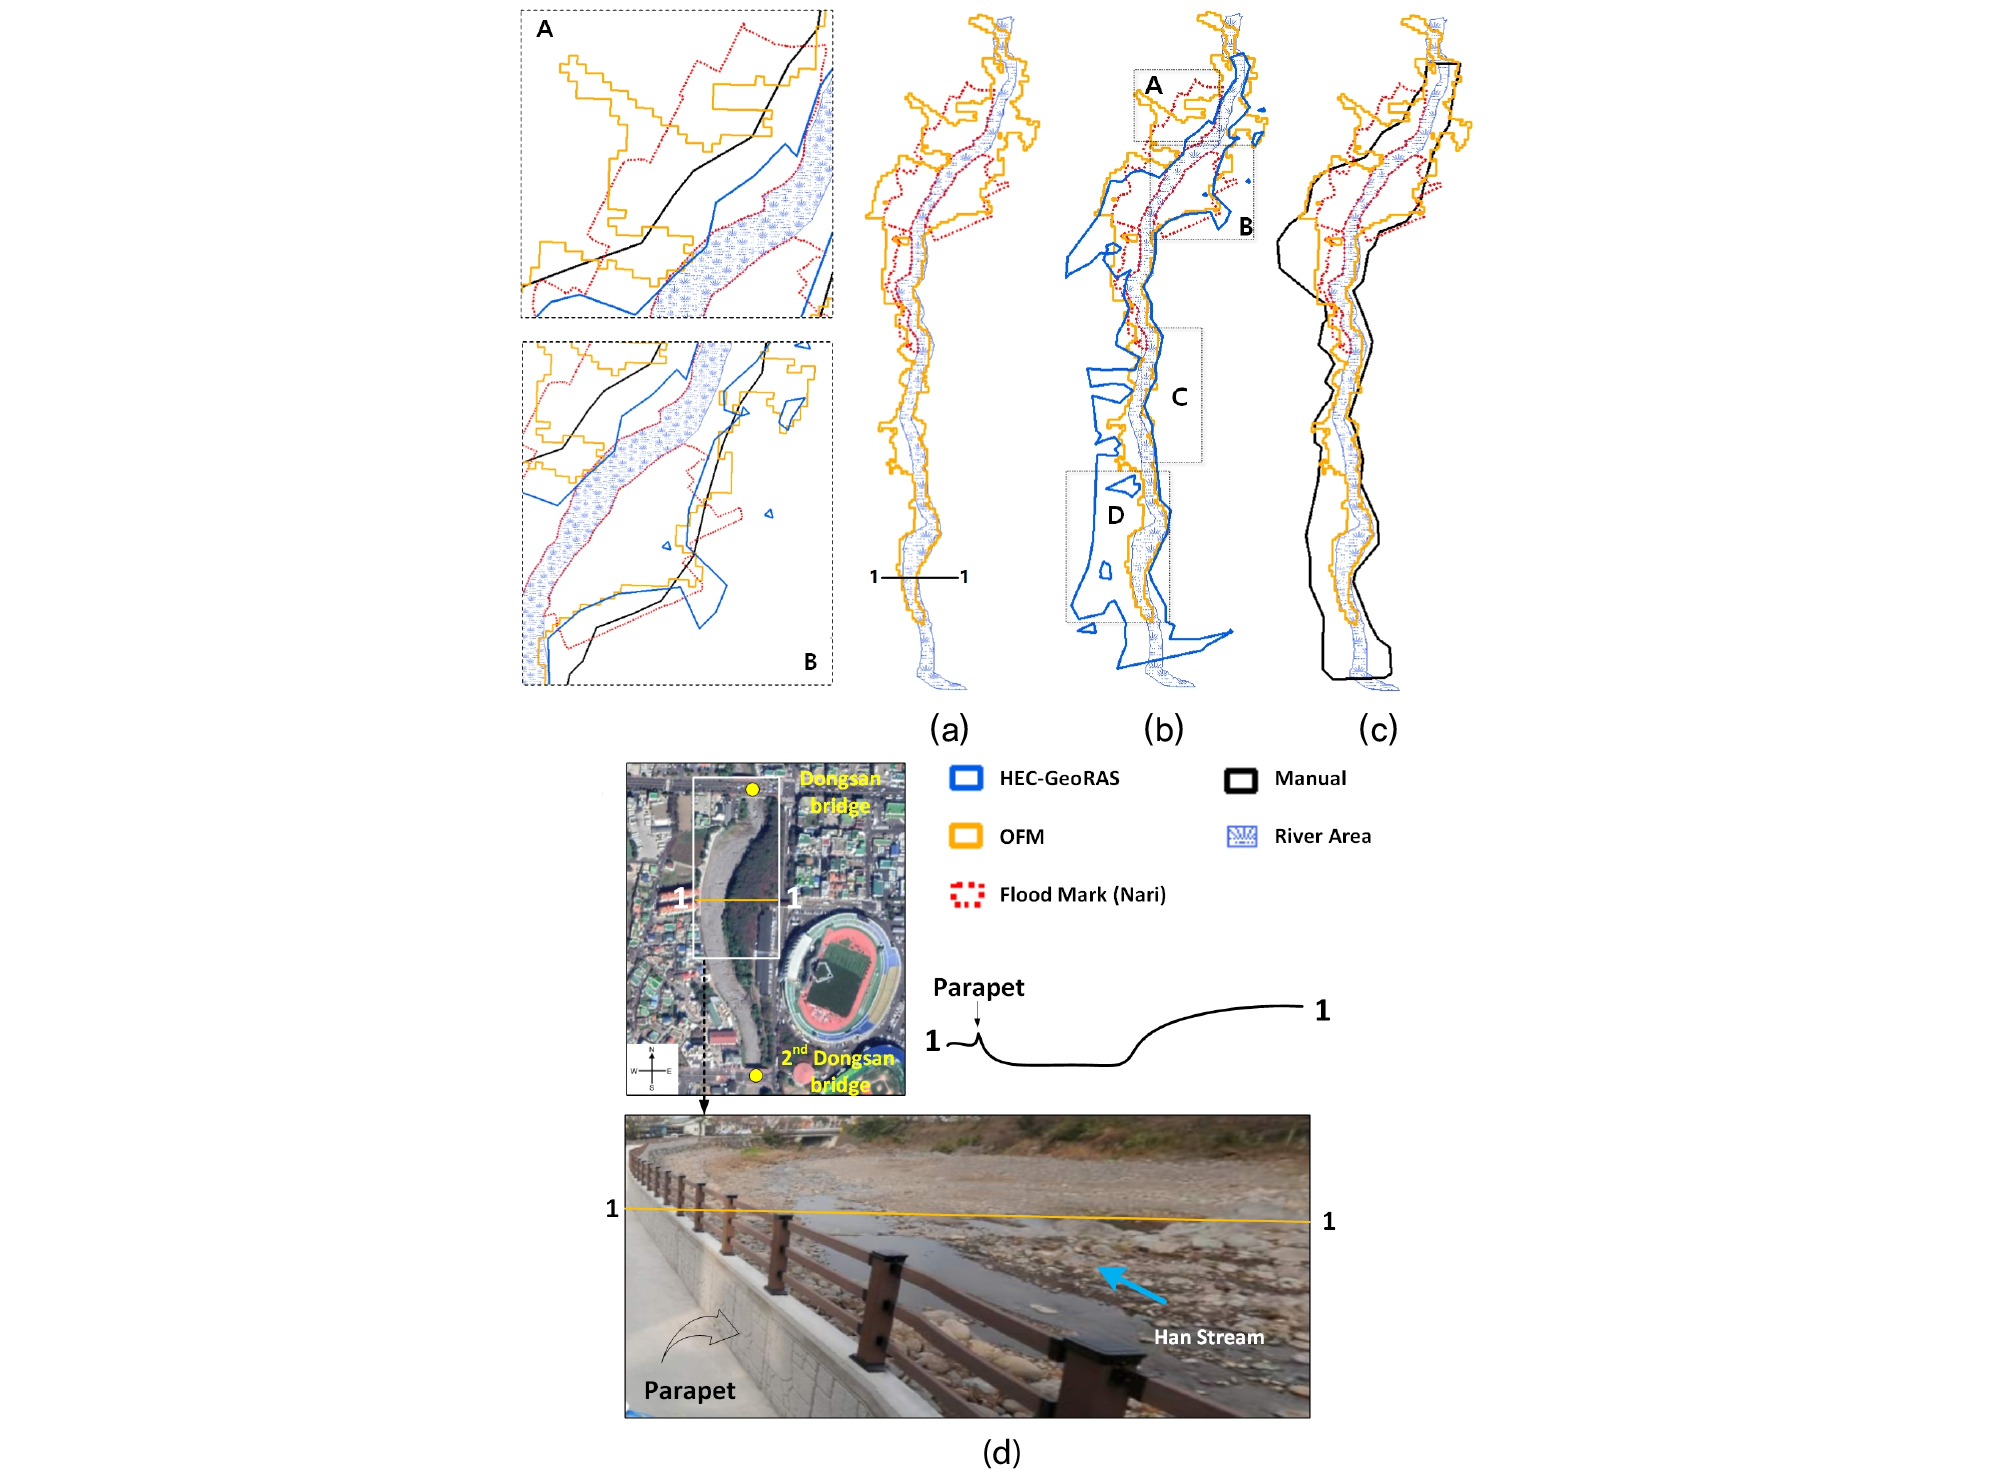 http://static.apub.kr/journalsite/sites/ksce/2019-039-06/N0110390603/images/Figure_KSCE_39_06_03_F12.jpg